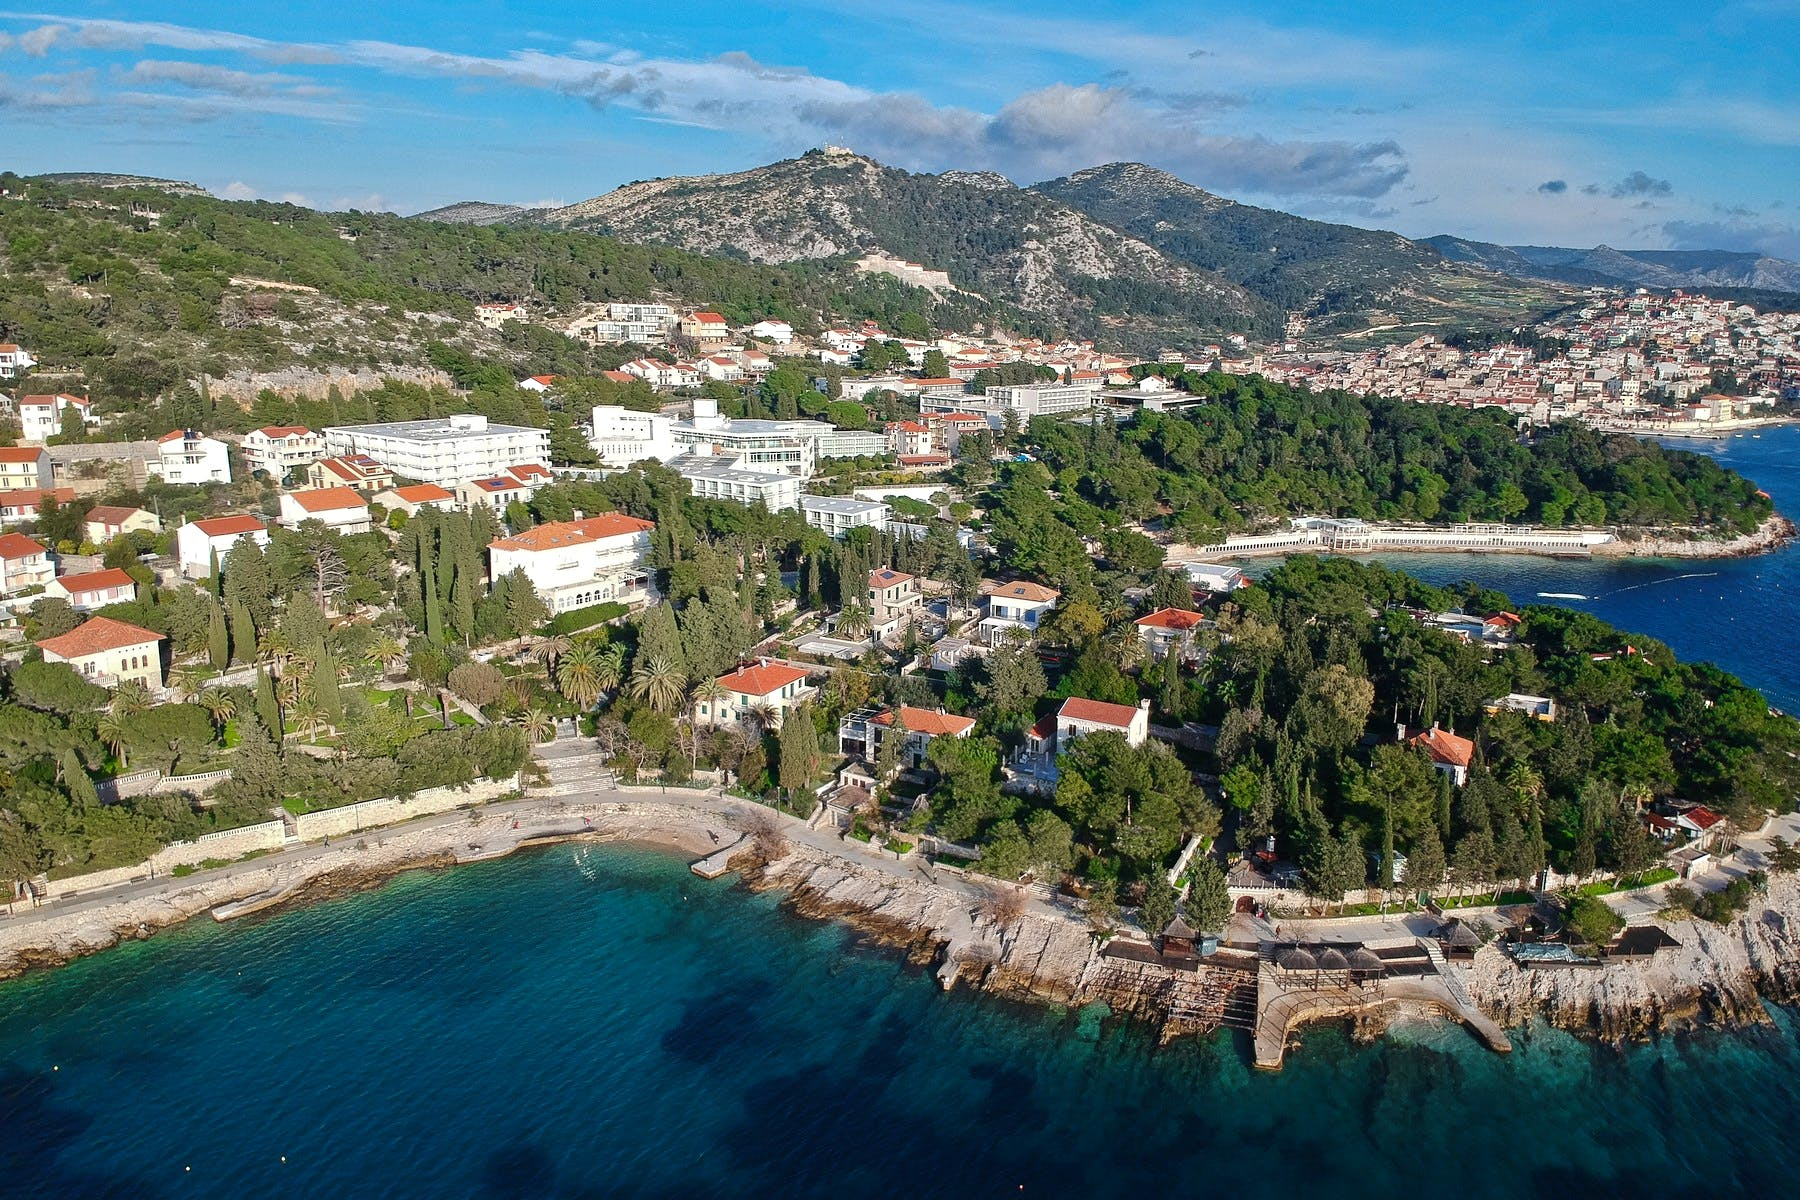 Panoramic view of Hvar